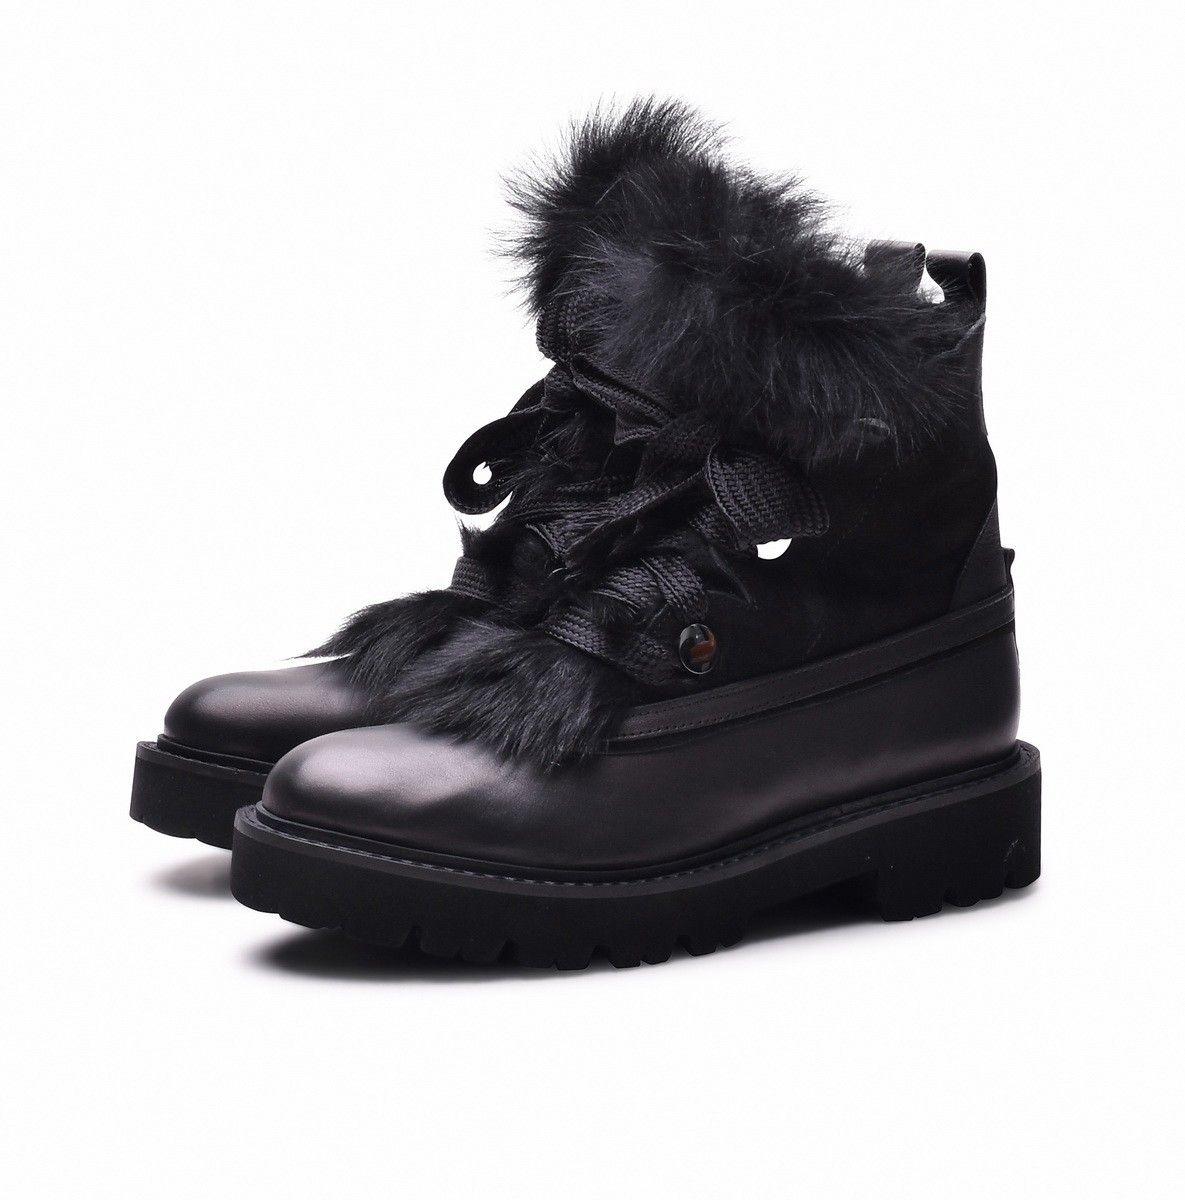 KENNEL & SCHMENGER - Damen Boot - Joe India Calf/Soed - Black